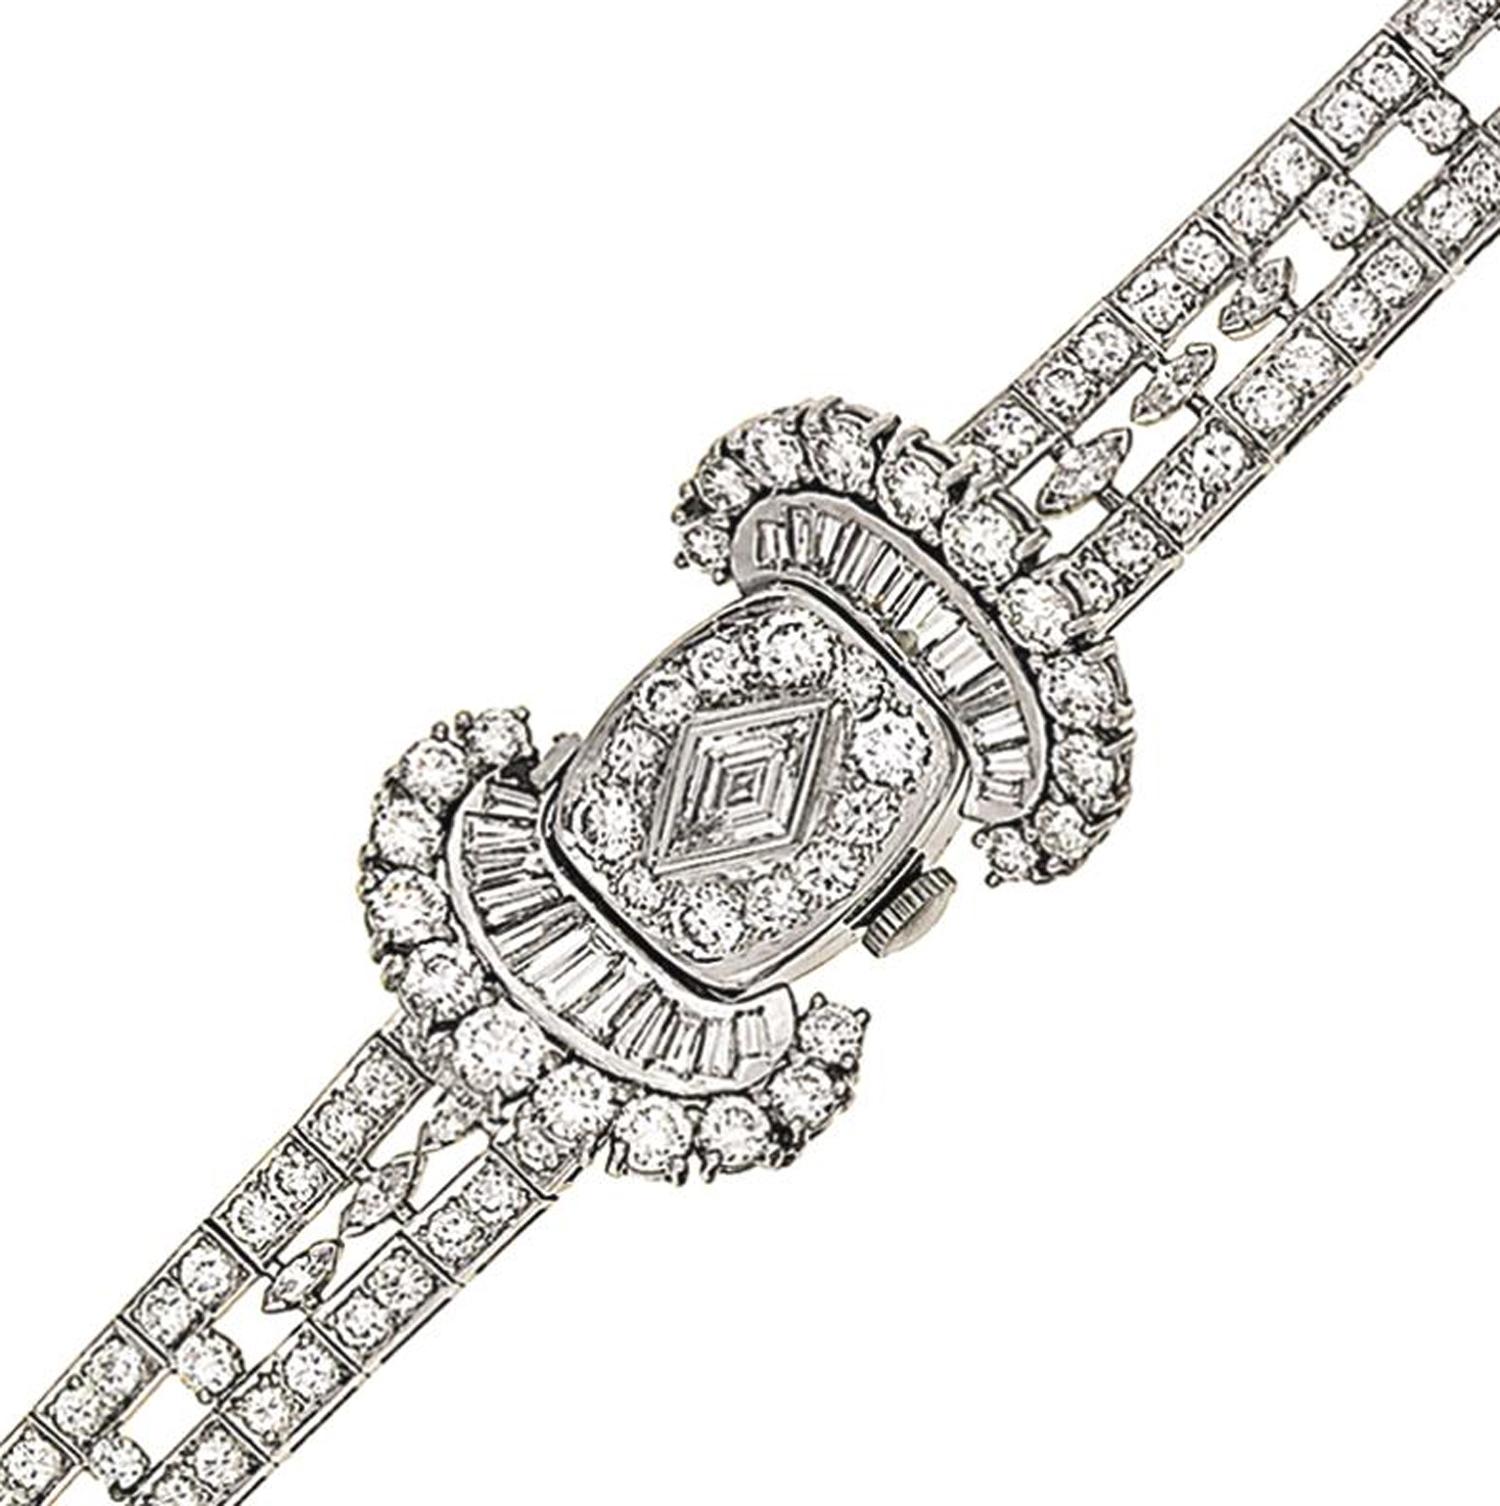 A lady's diamond cocktail watch, by Hamilton & Co